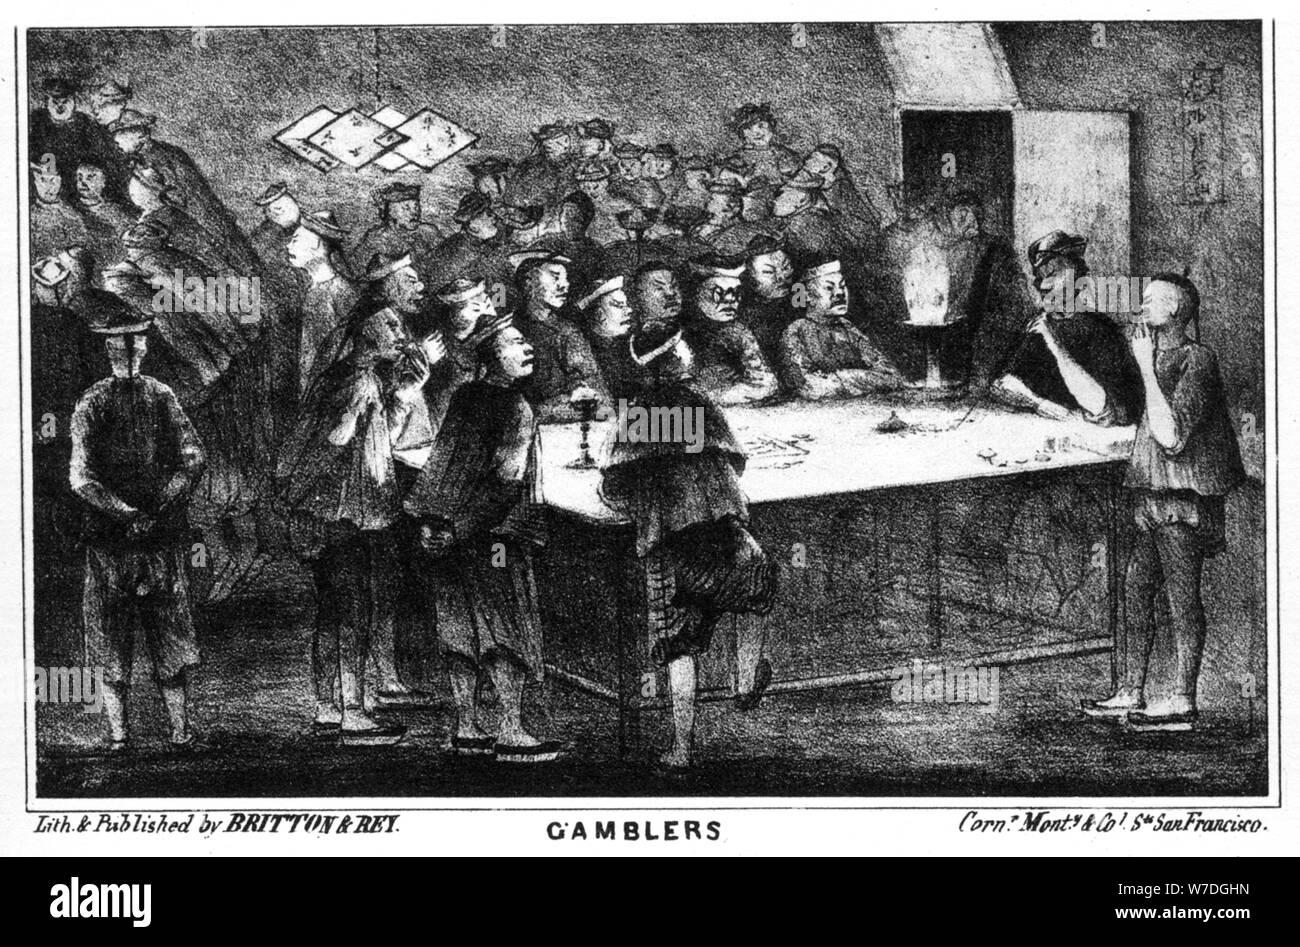 Gambling during the Californian gold rush, 19th century (1937).Artist: Britton & Rey Stock Photo